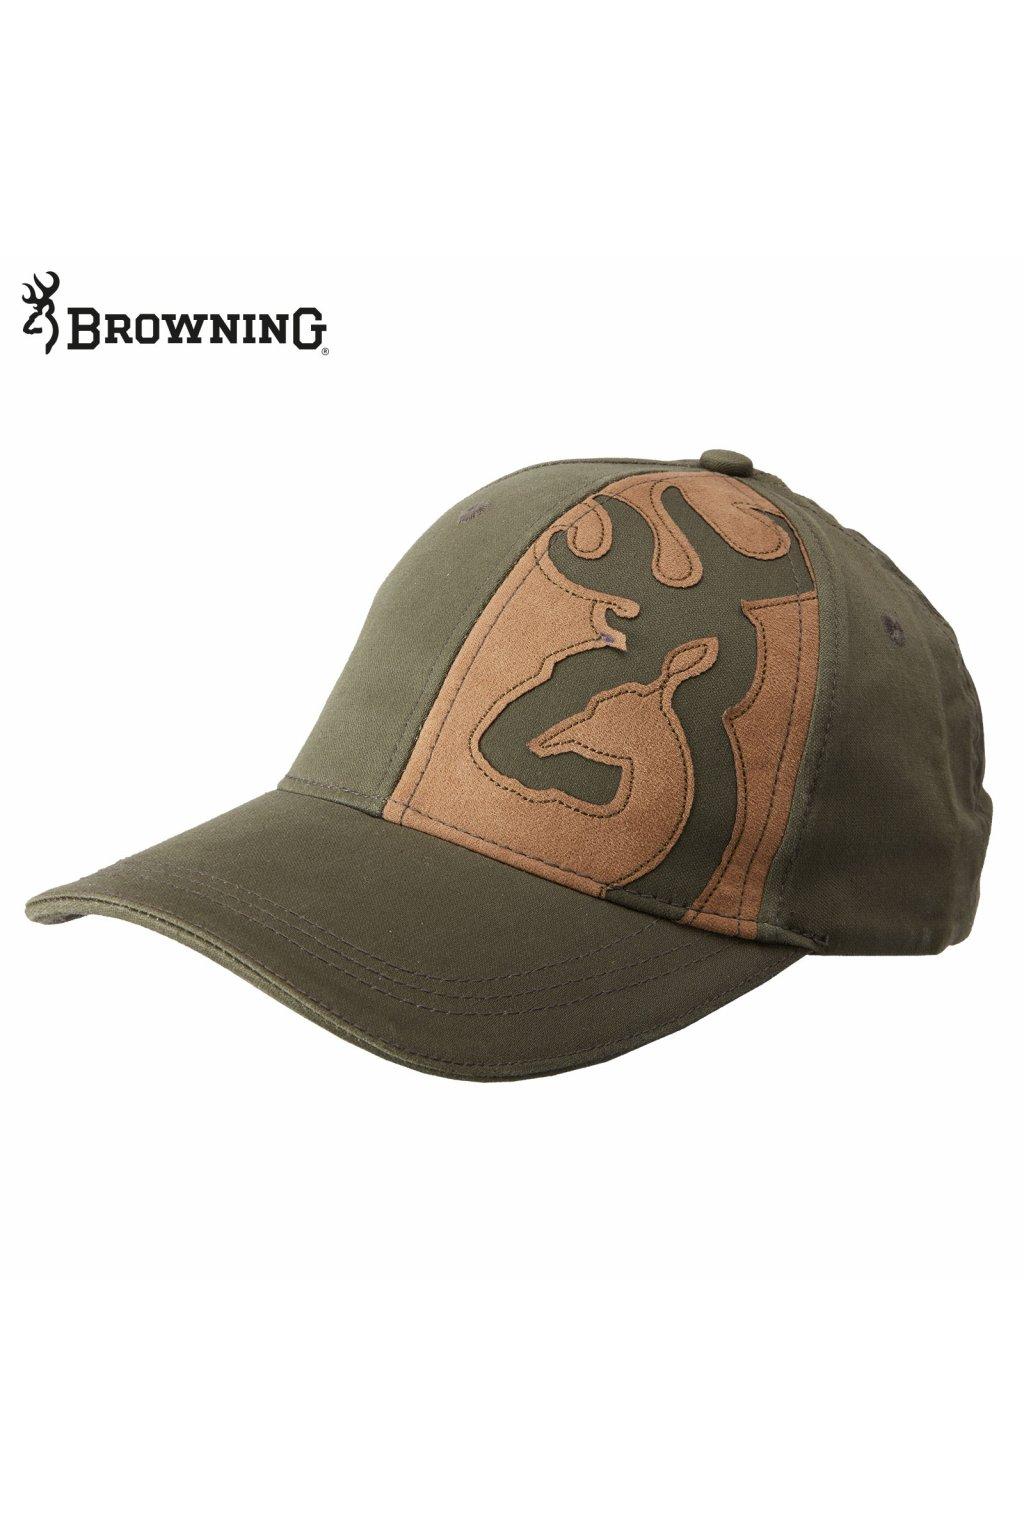 BROWNING - kšiltovka pánská BUCKSHOT